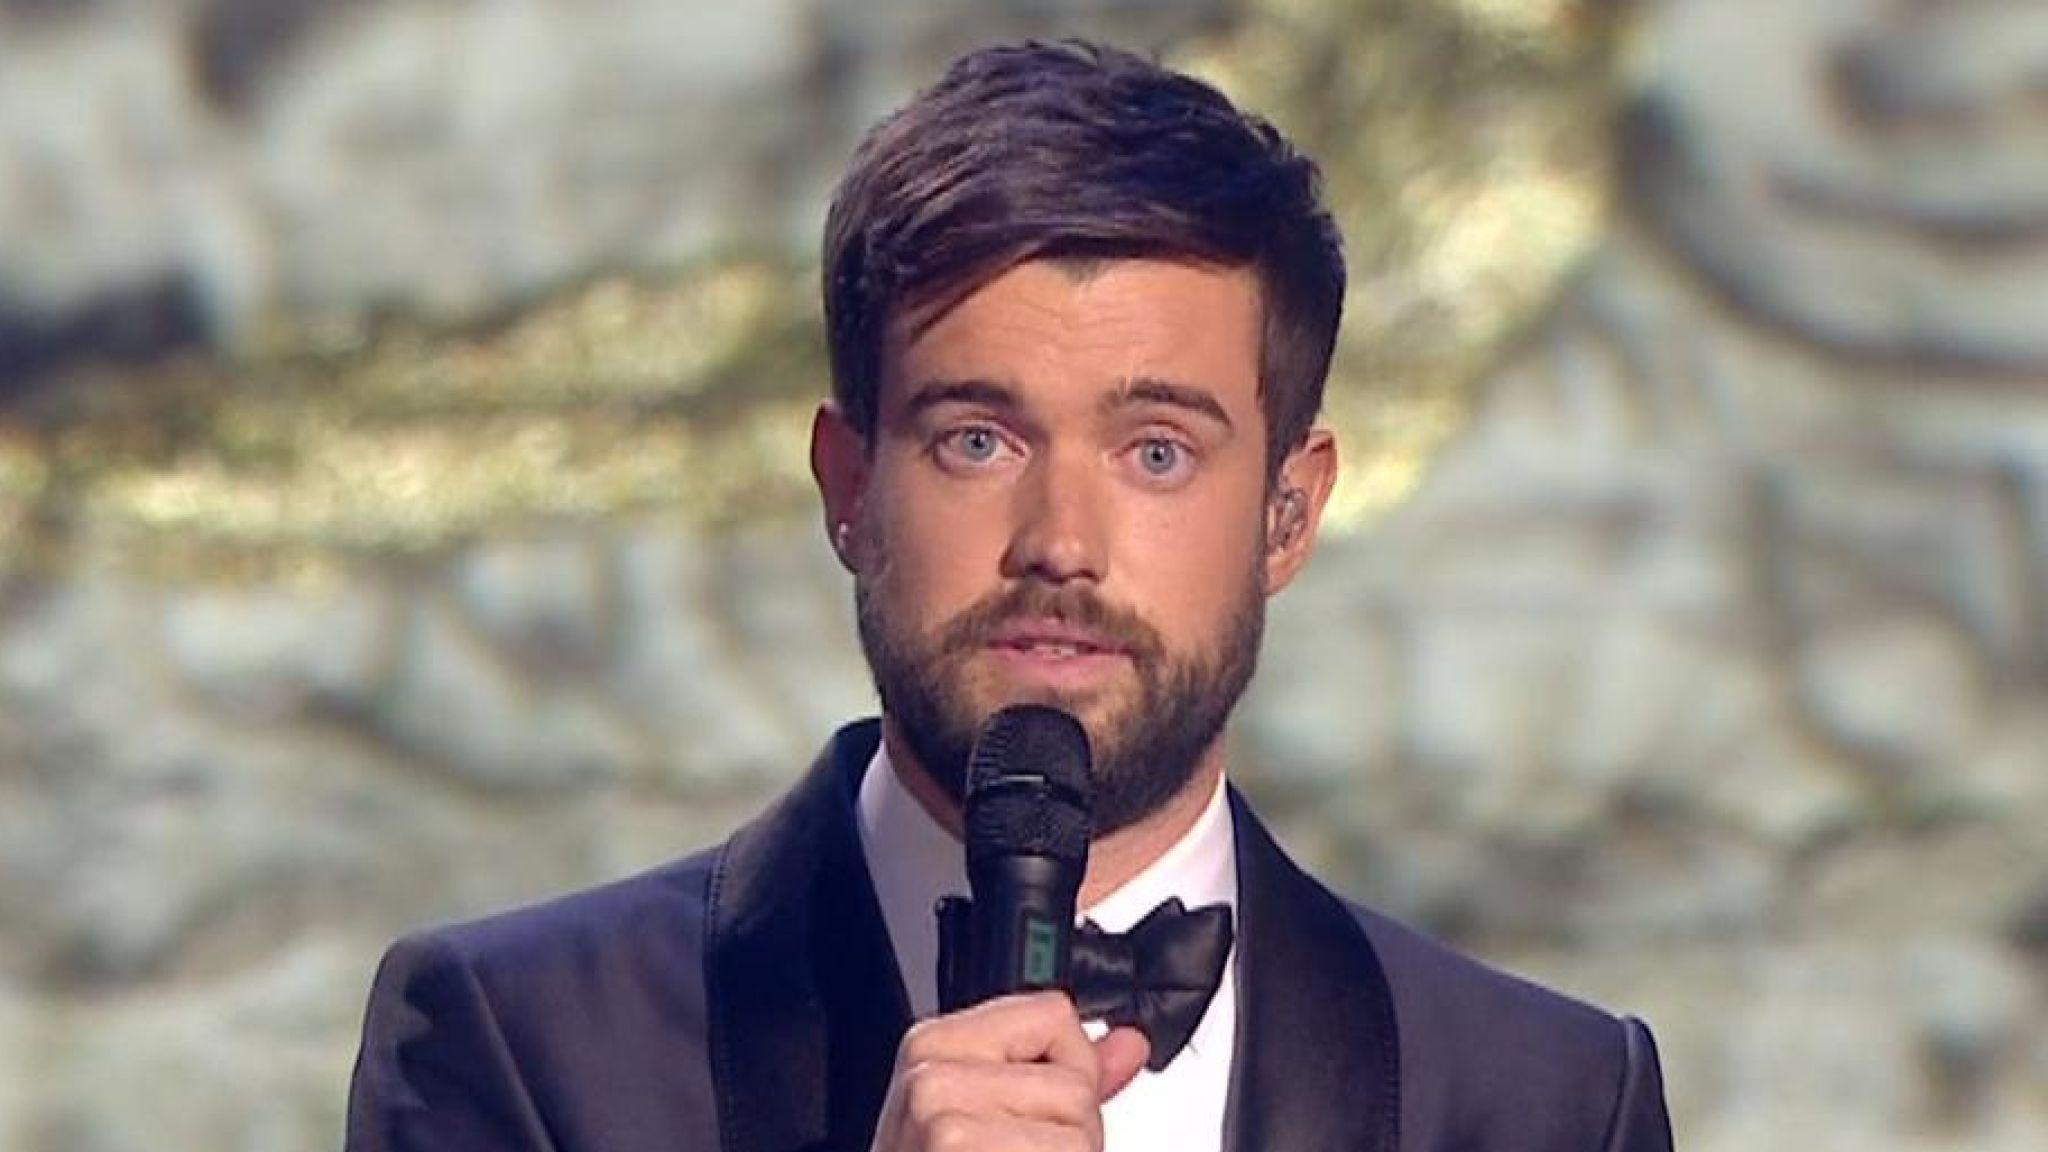 Brit Awards presenter Jack Whitehall pays tribute to Caroline Flack